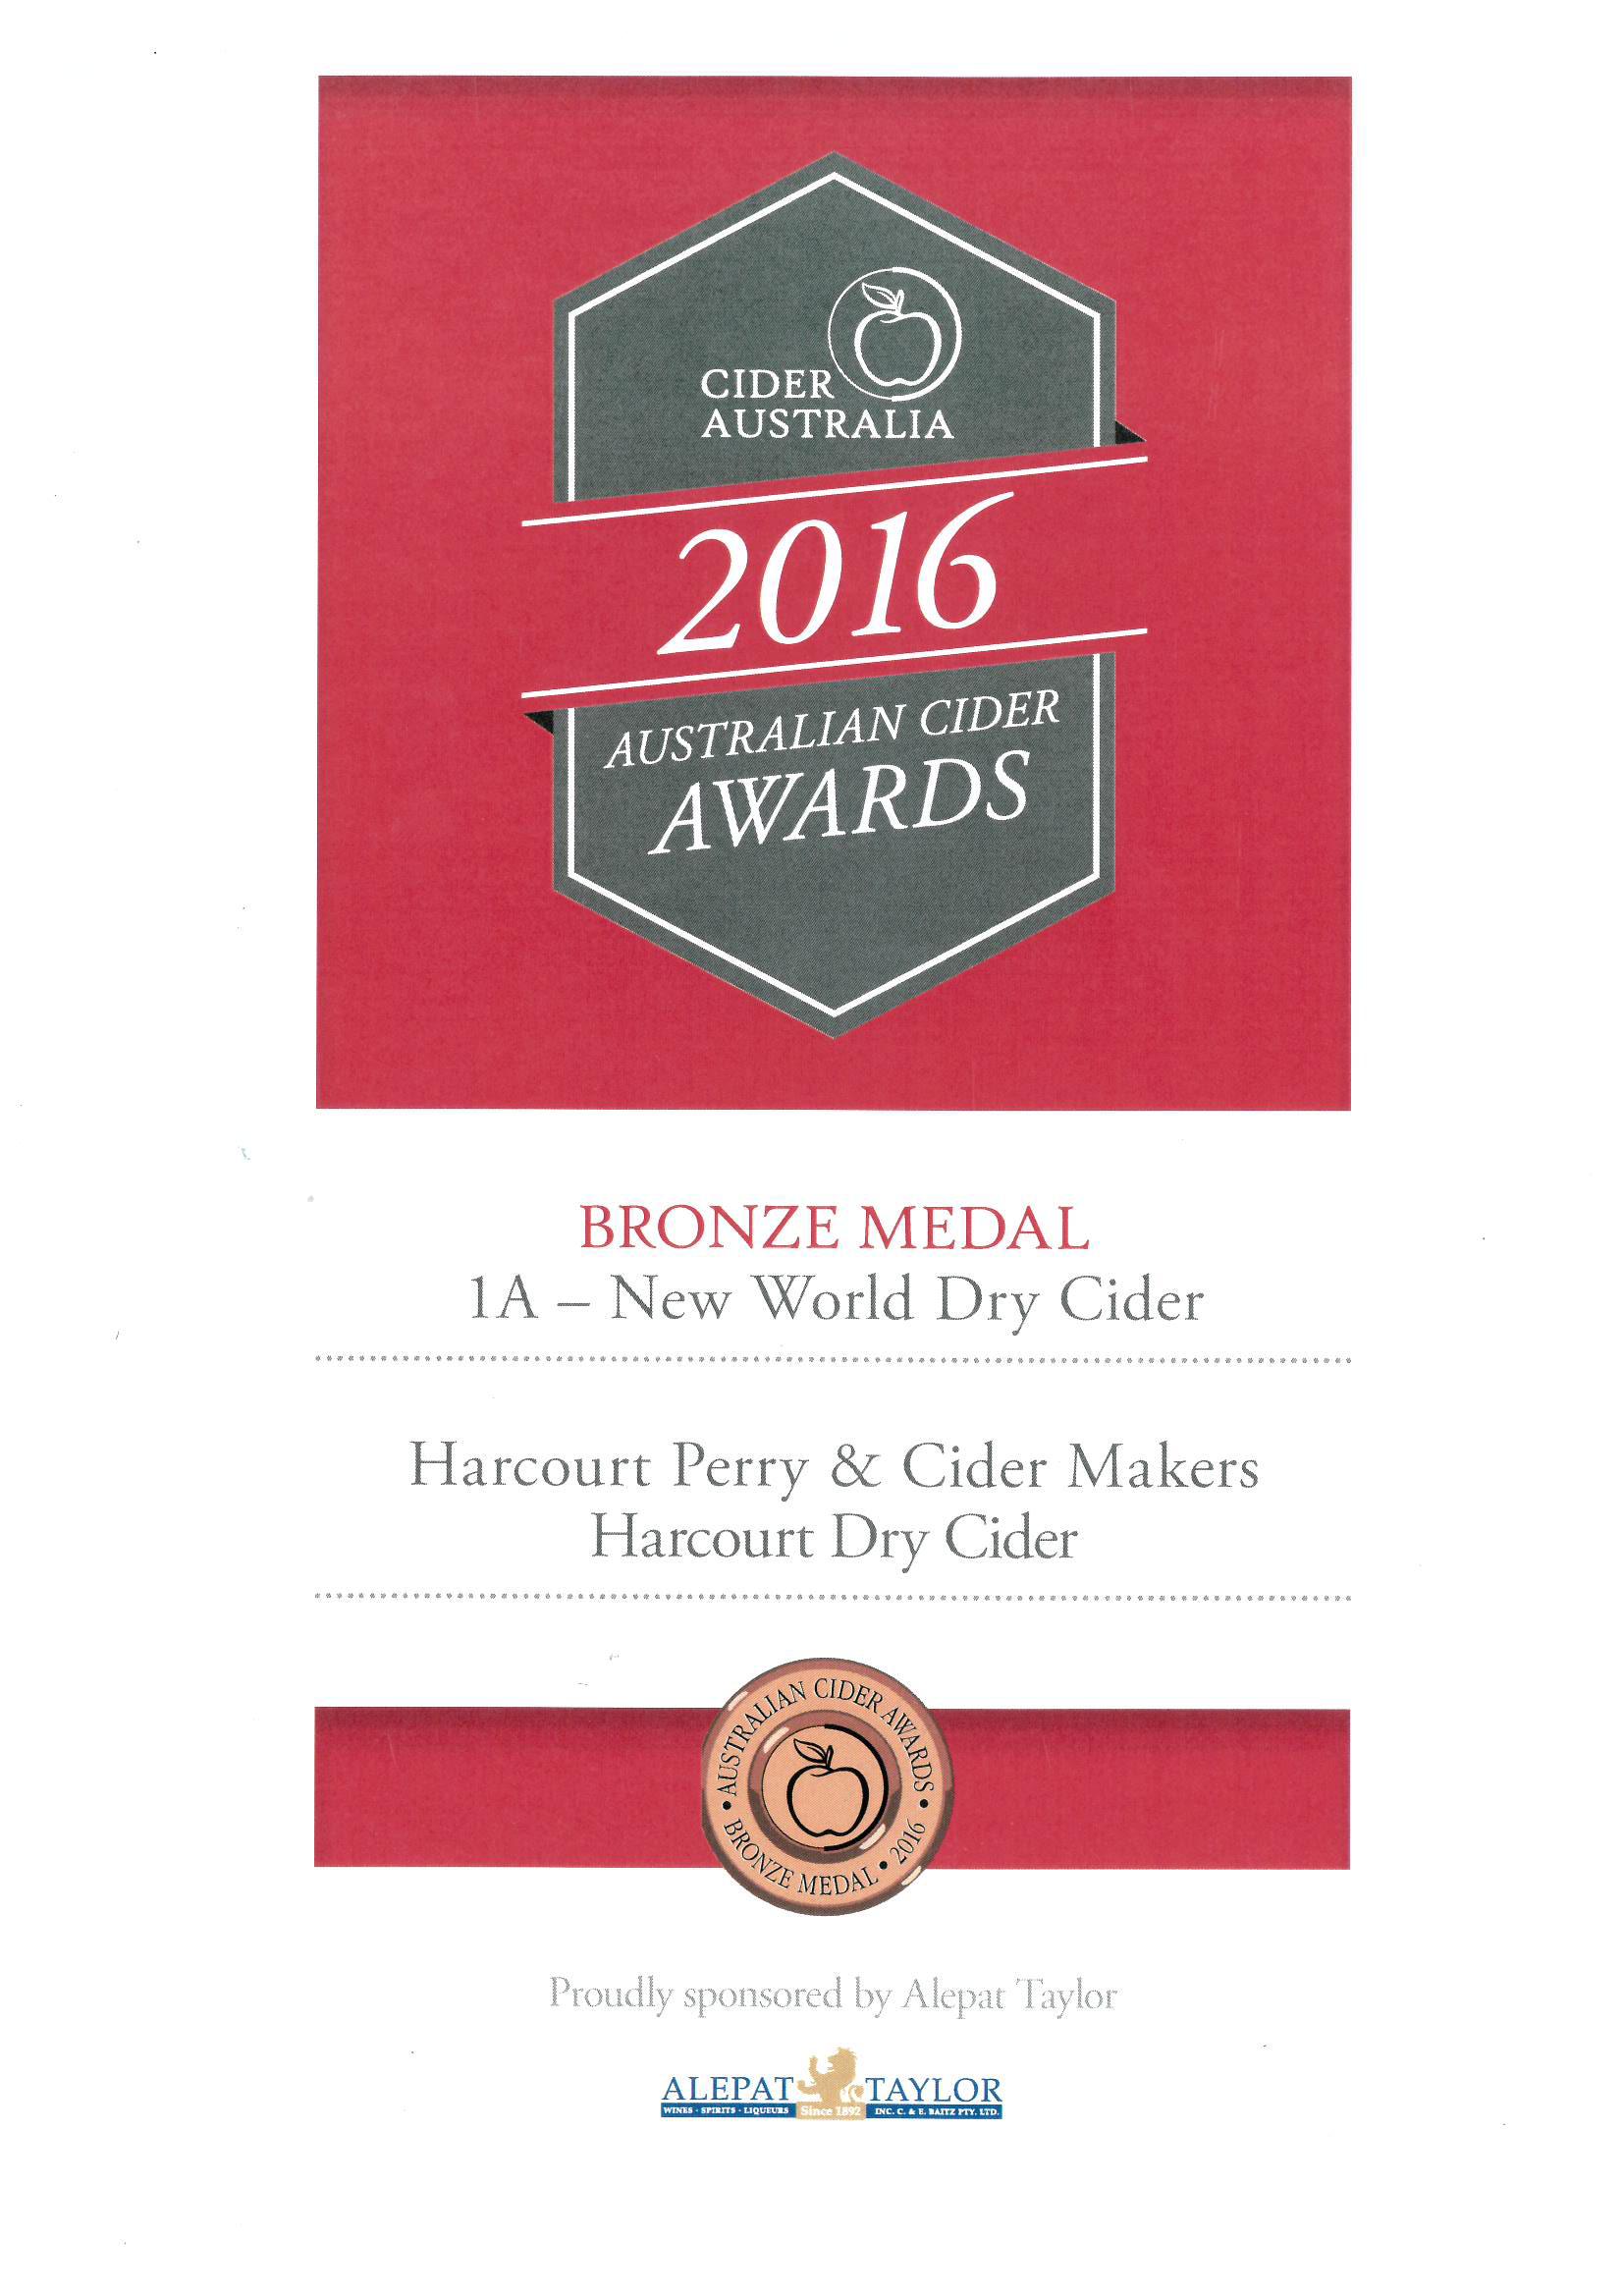 Cider Aust 2016 Dry Cider Bronze